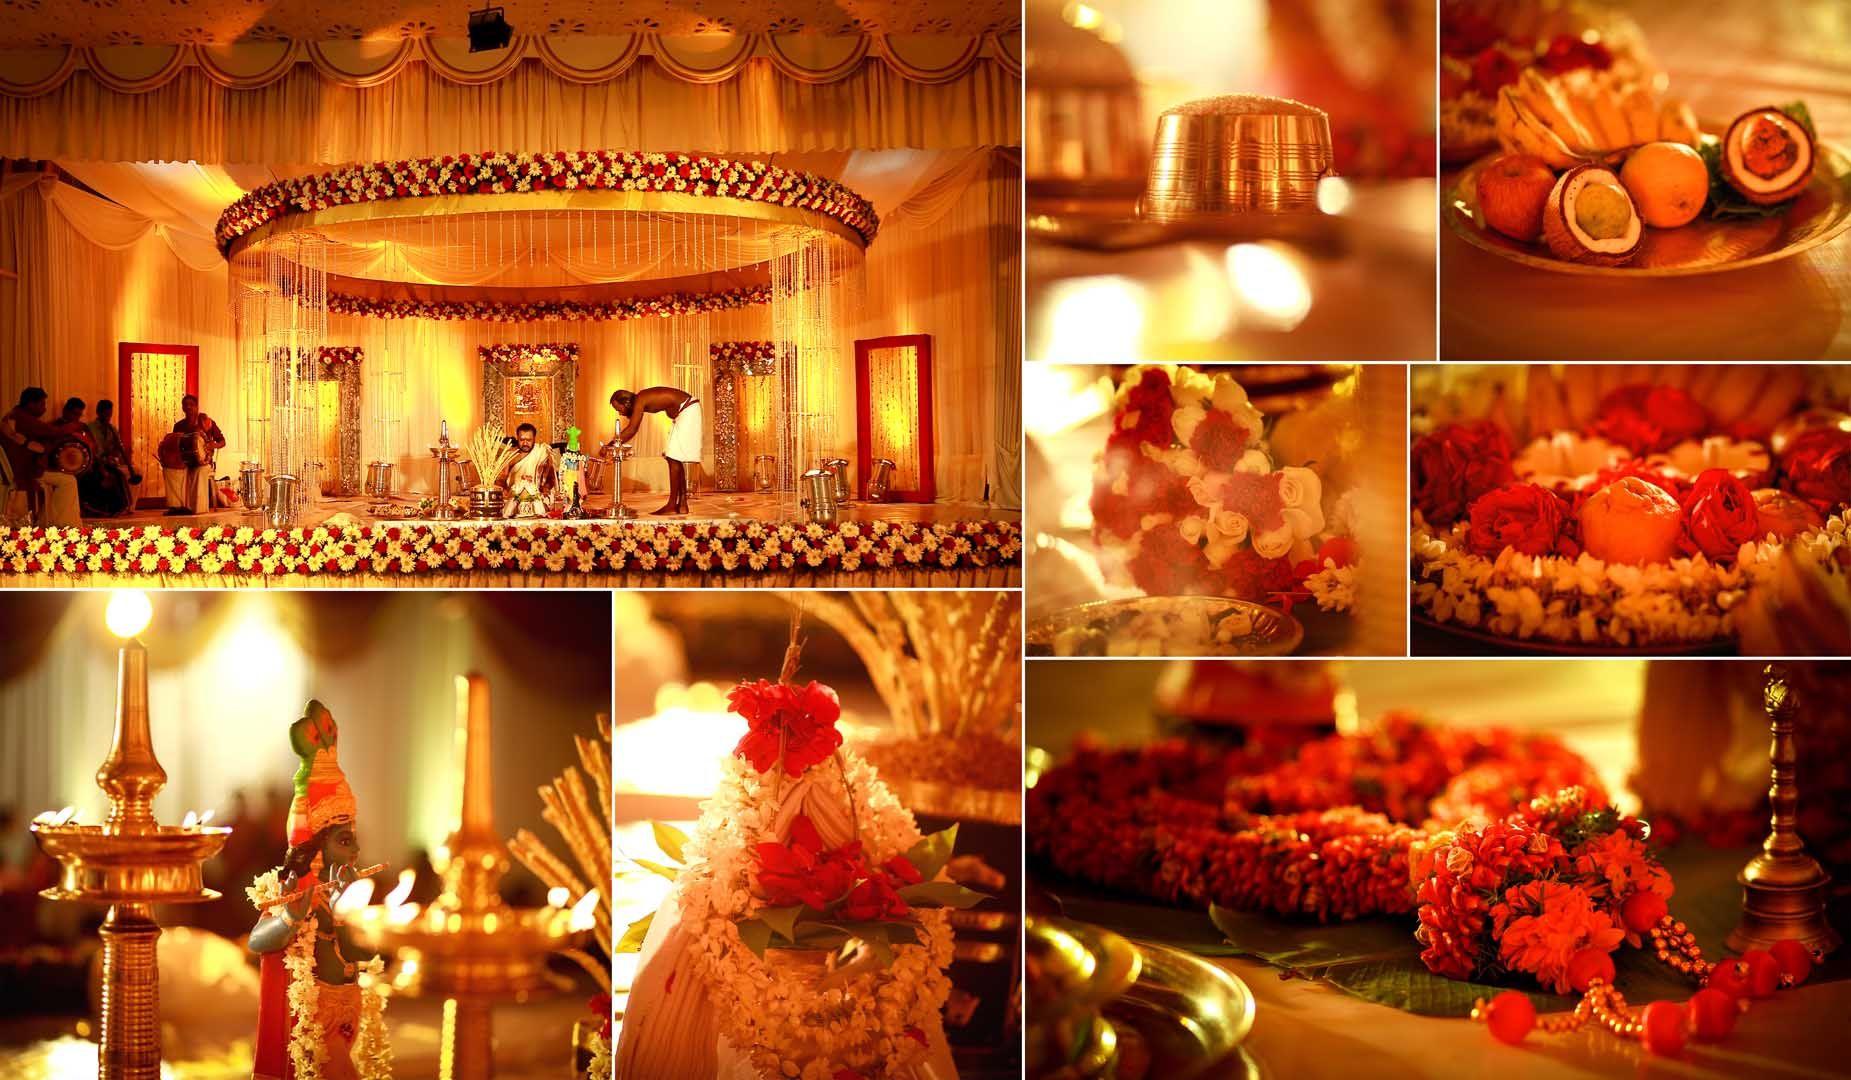 Wedding stage decoration ideas kerala  my wedding stage and decorhindu kerala weddingtraditionalflowers